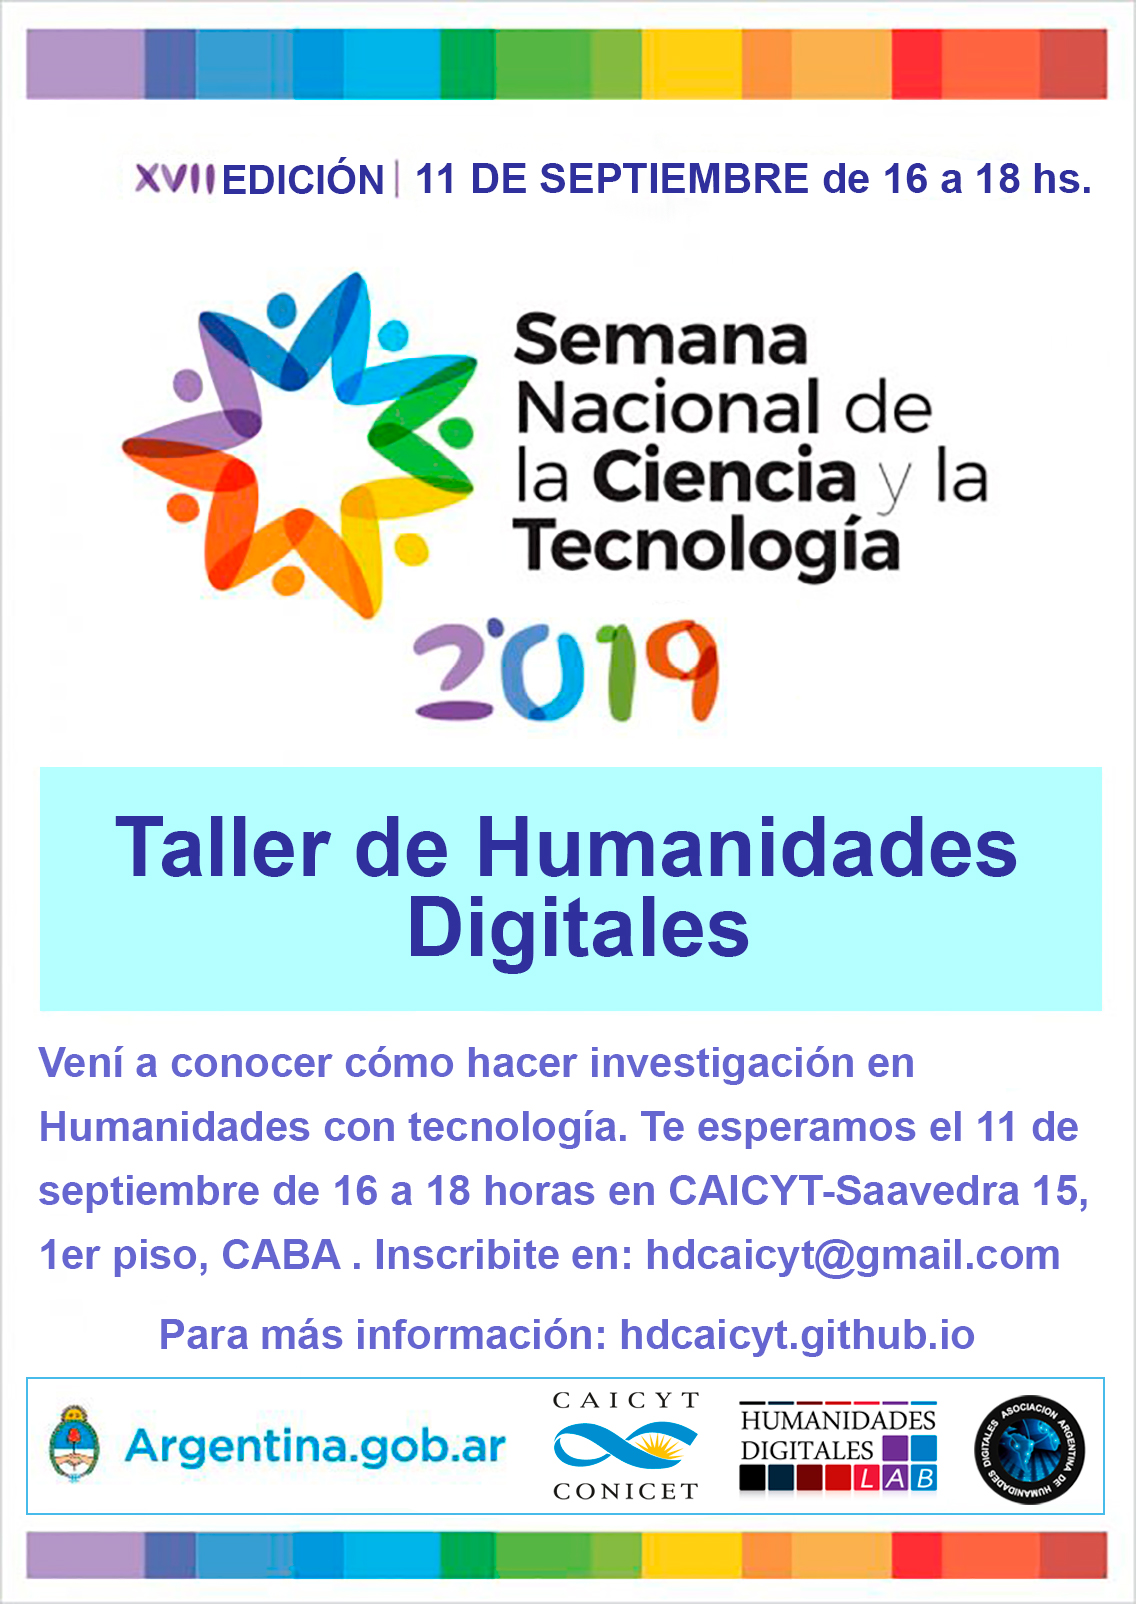 Taller de Humanidades Digitales